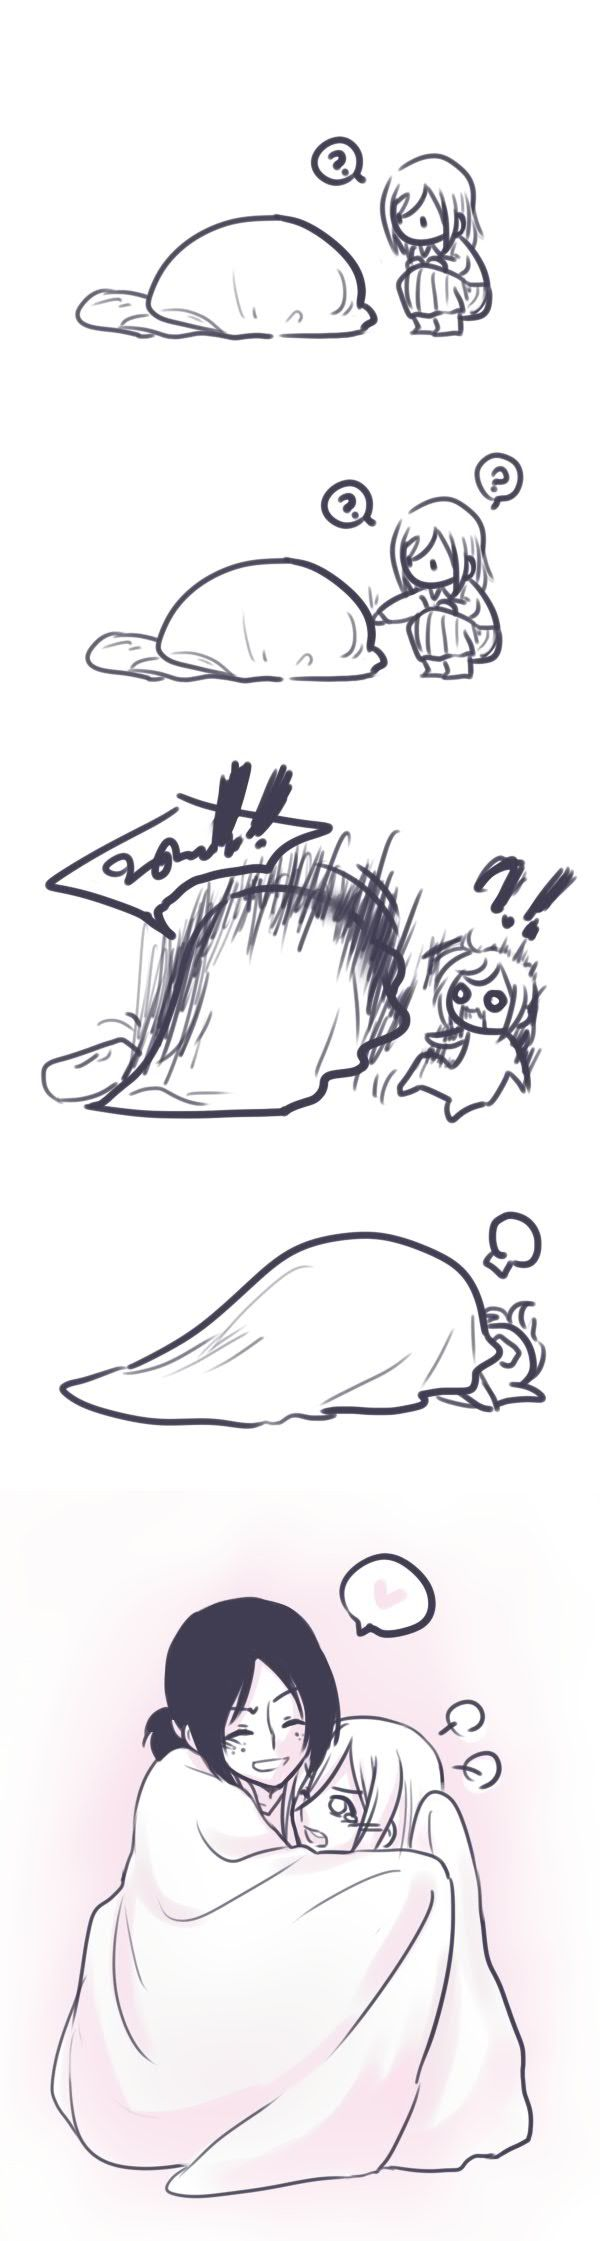 Shingeki no Kyojin, Cute, Ymir x Christa